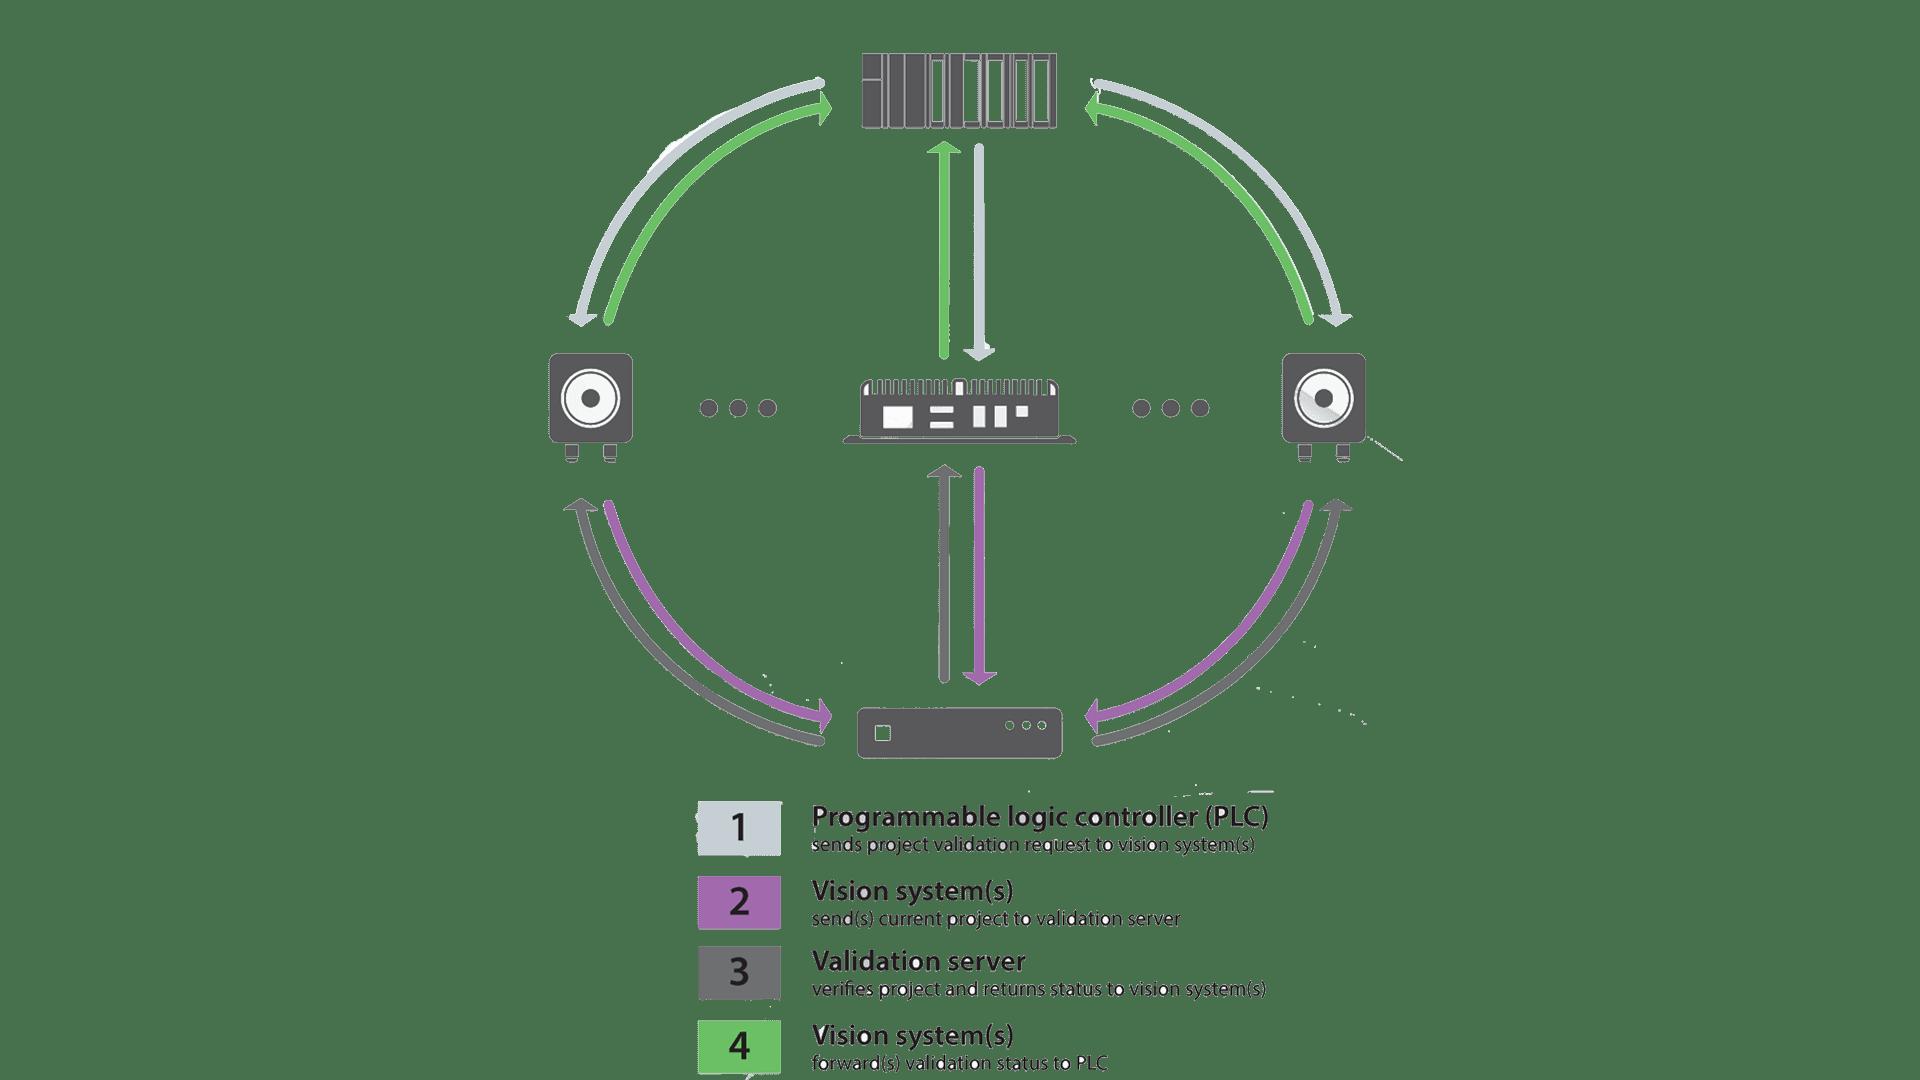 Project Change Validator